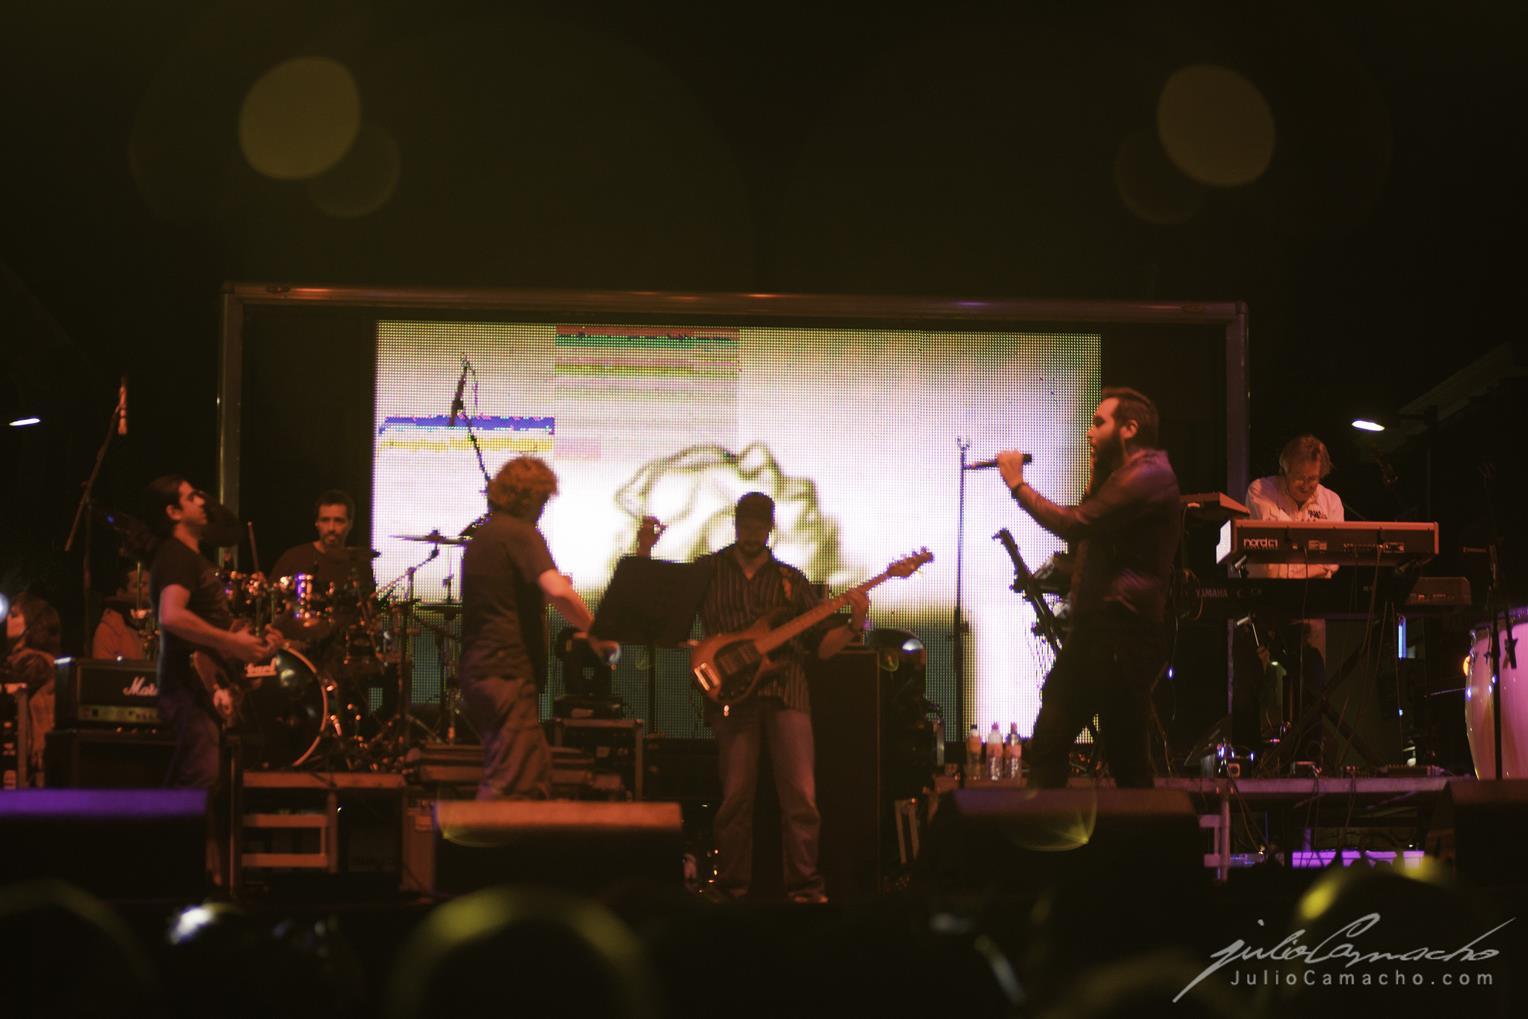 2014-10-30 31 CAST TOUR Ensenada y Tijuana - 1404 - www.Juli (Copy).jpg